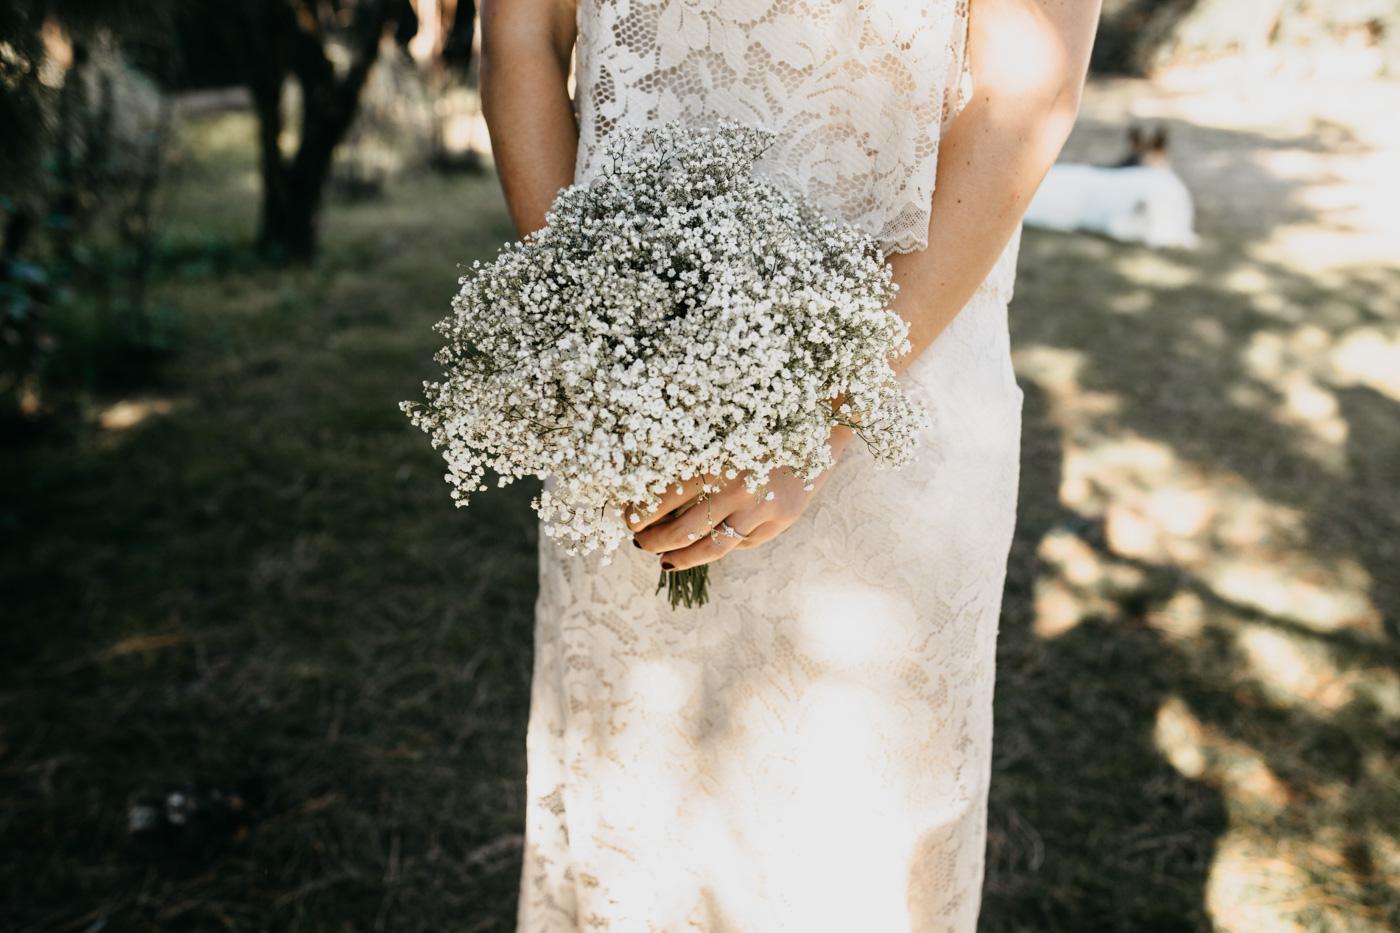 Velvet-Hush-fotografos-boda-al-aire-libre-madrid-037